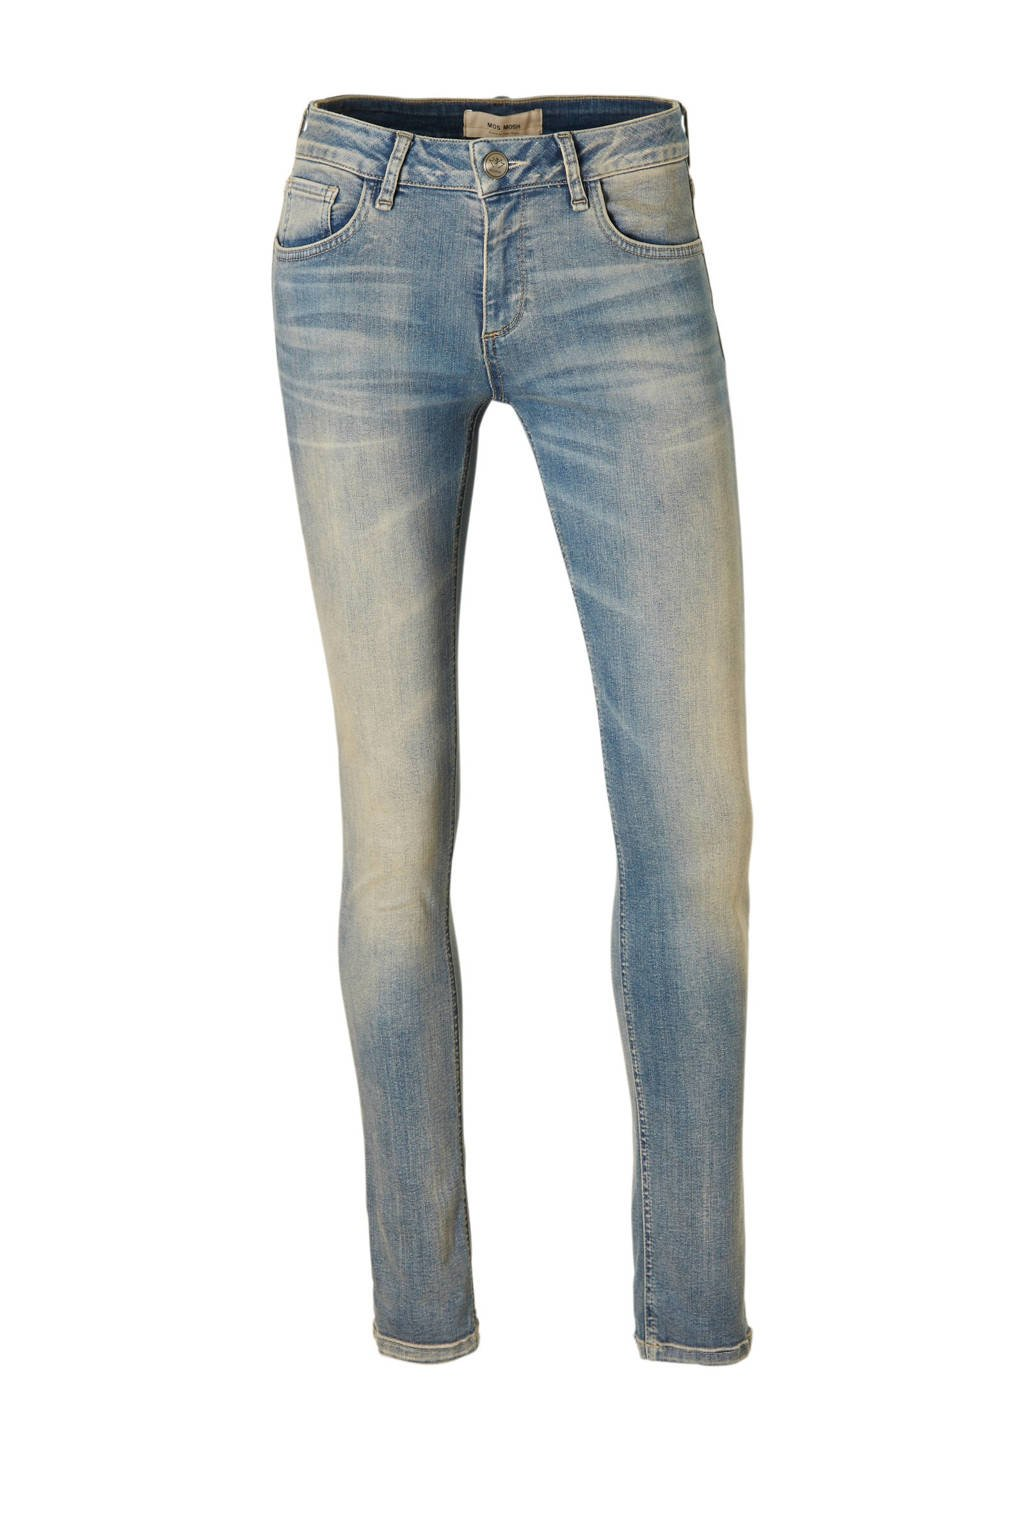 Mos Mosh Summer ids slim fit jeans, Katoen